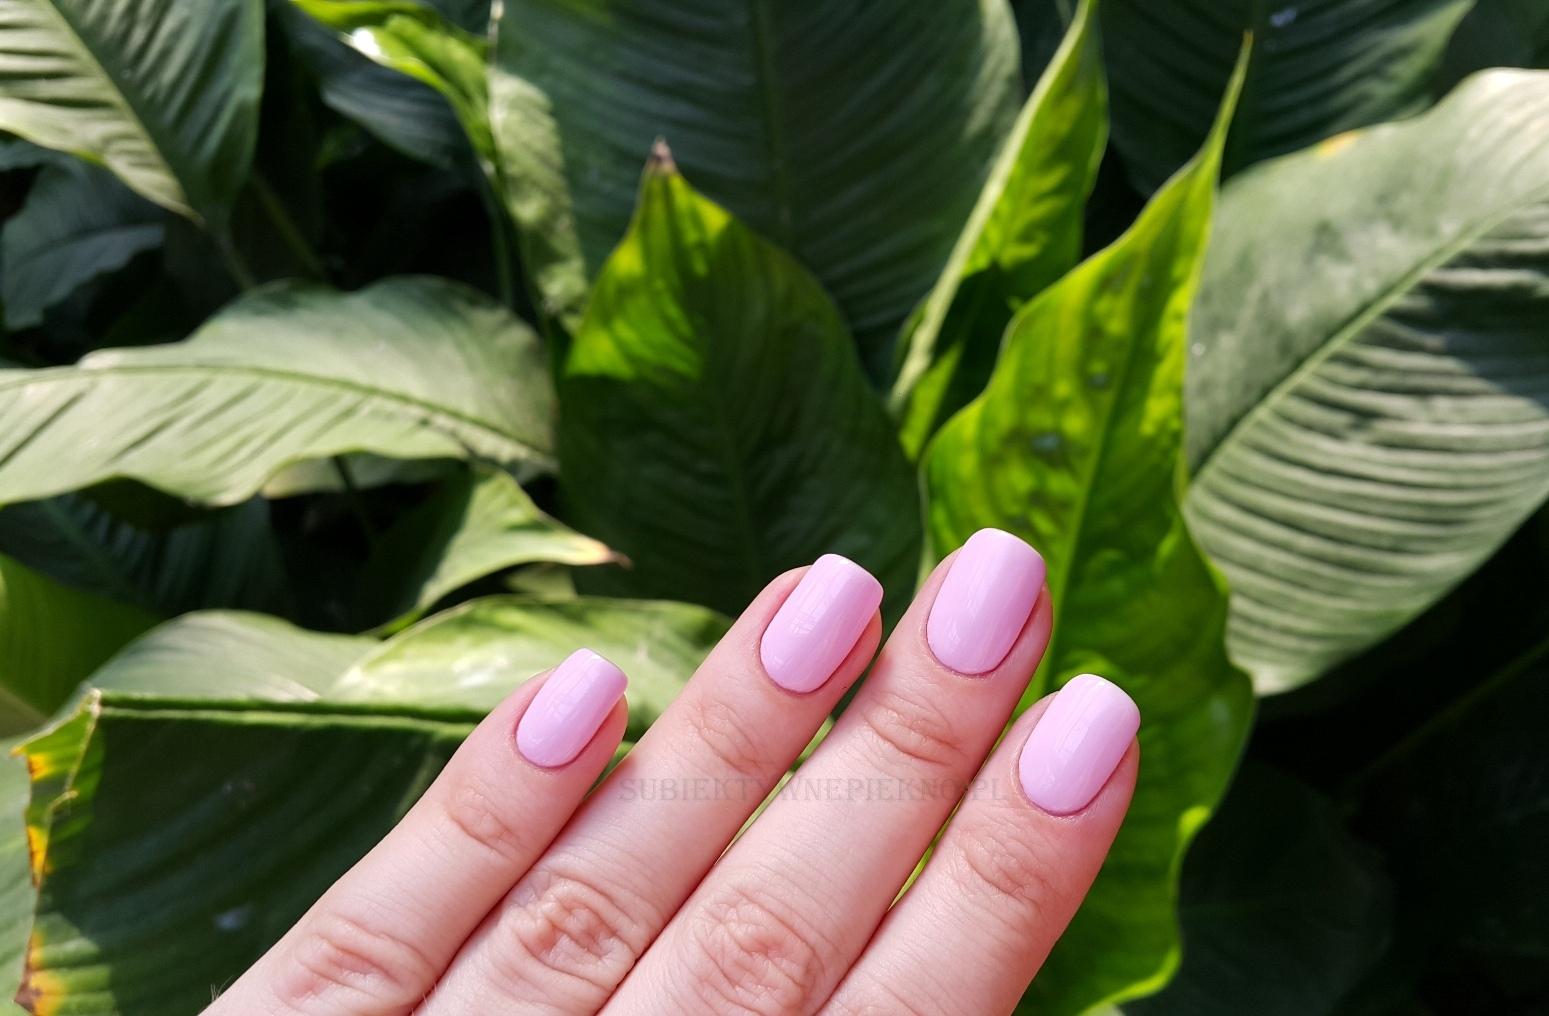 Lakier hybrydowy Light Lavender NeoNail 3193 swatche